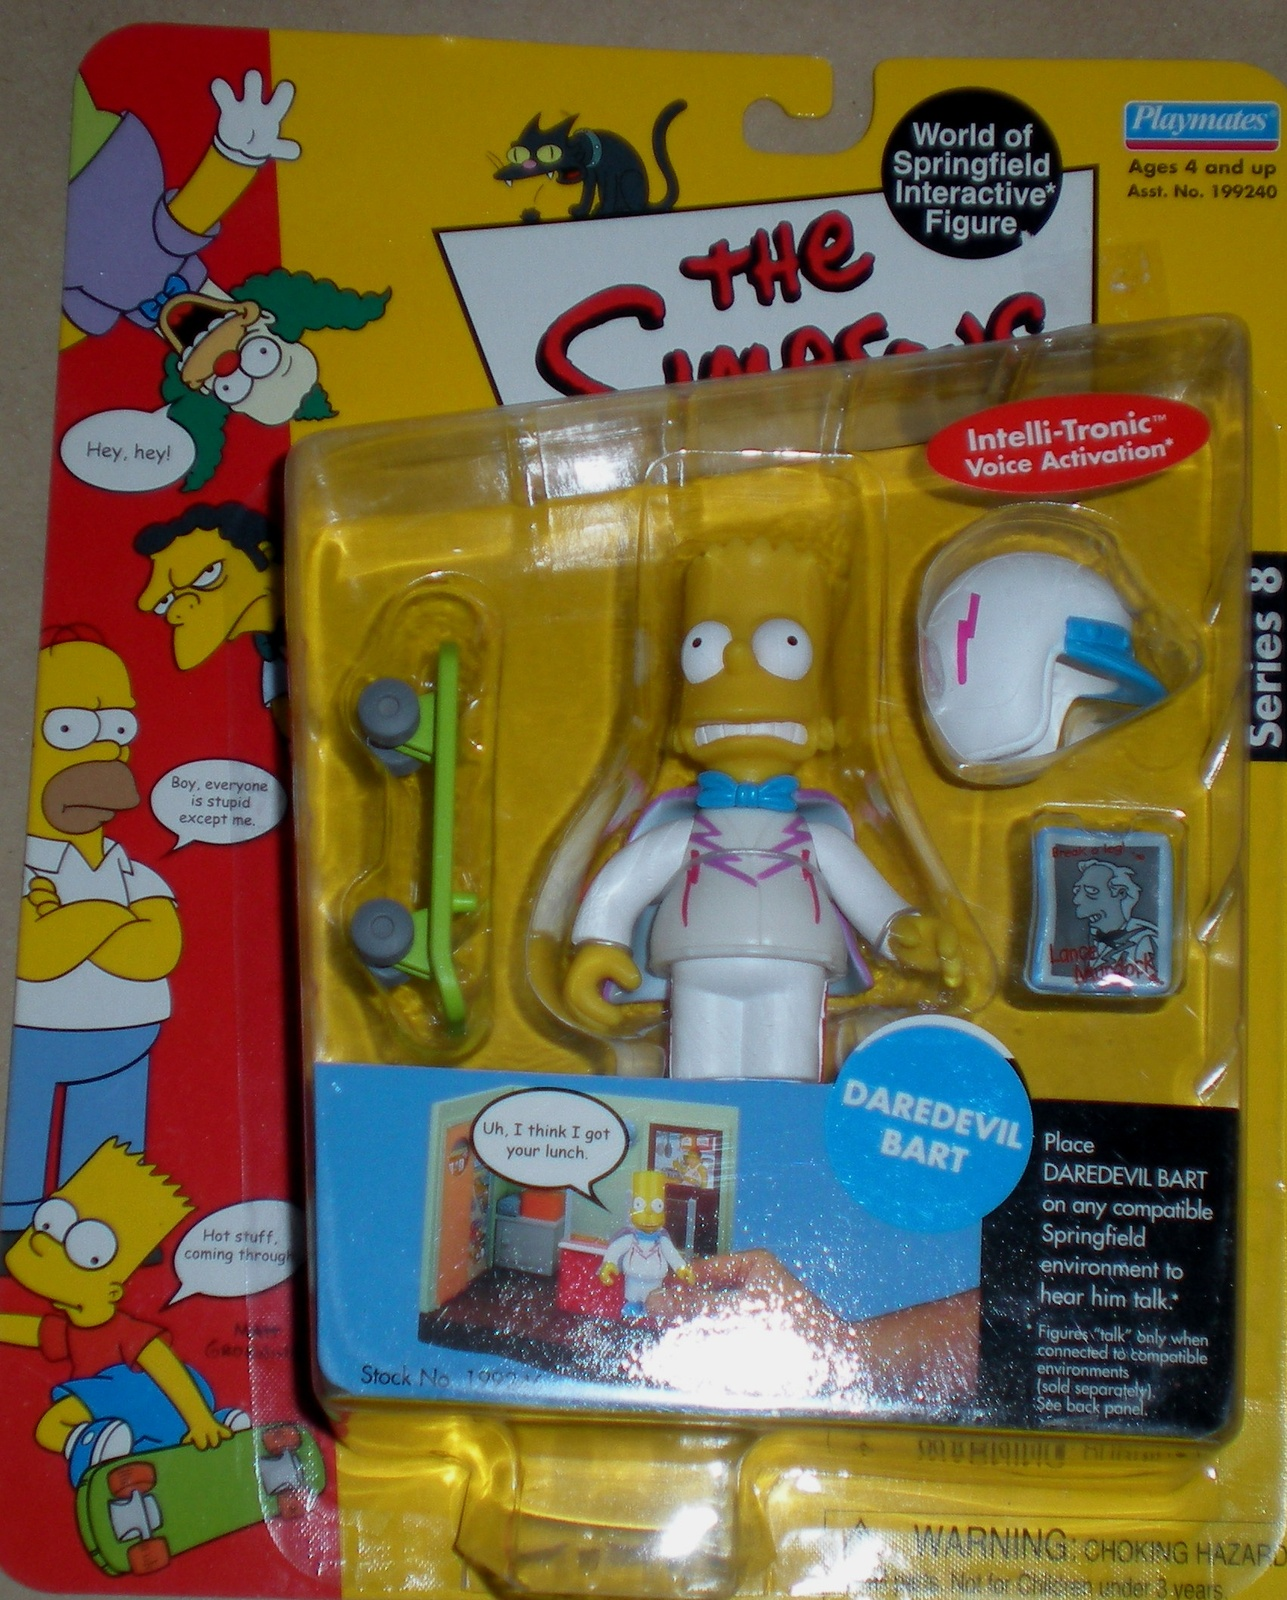 Simpson's DareDevil Bart Series 8 image 2